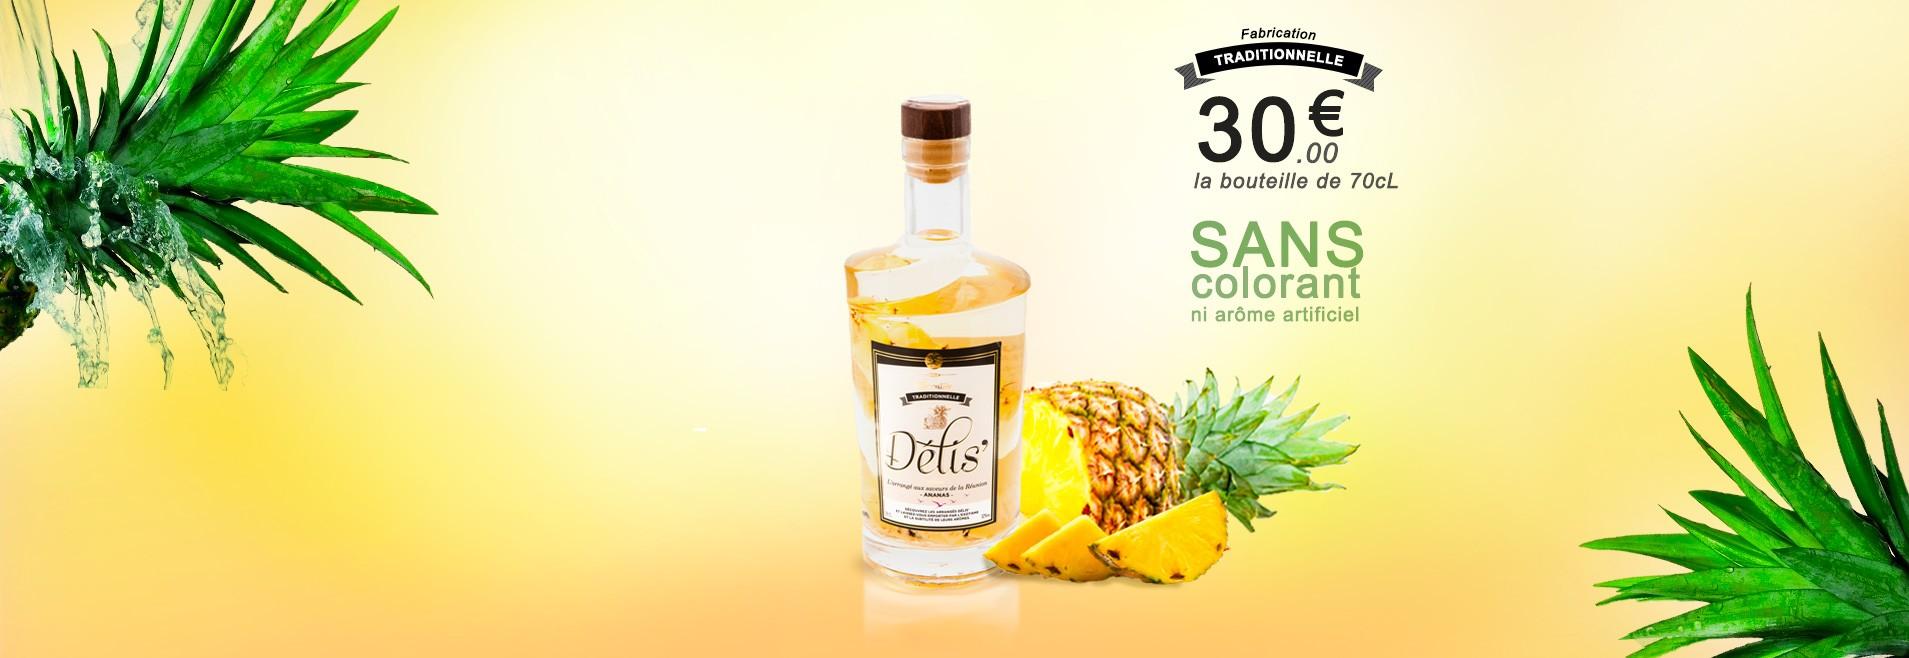 Ananas : le Rhum arrangé à l'ananas Victoria